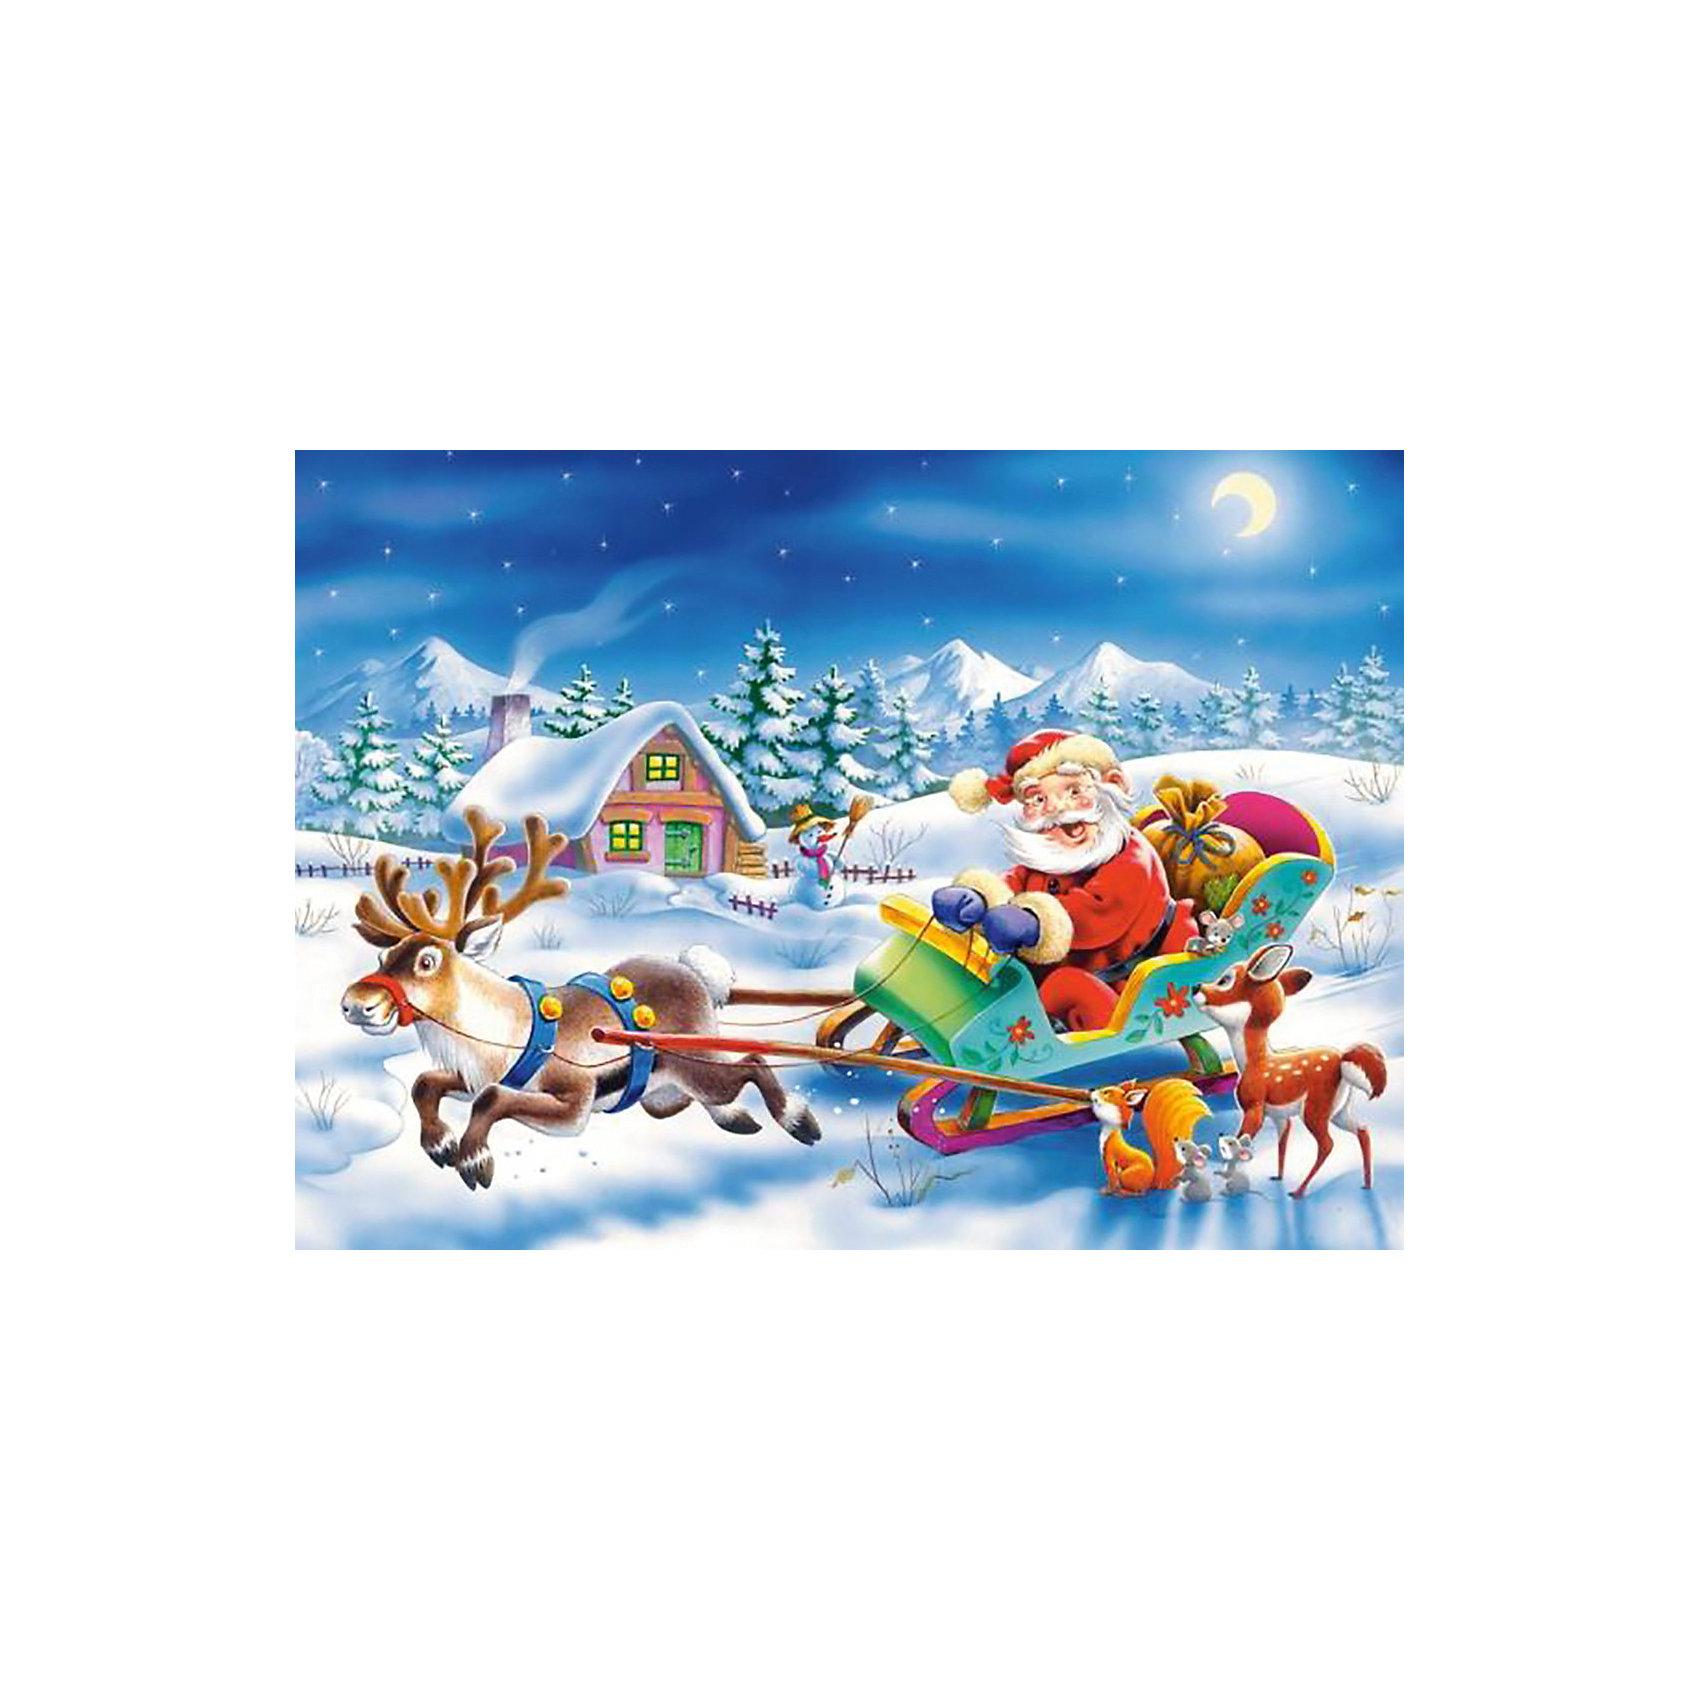 Castorland Пазл Рождество, 260 деталей , Castorland castorland пазл на отдыхе winx club 260 деталей castorland